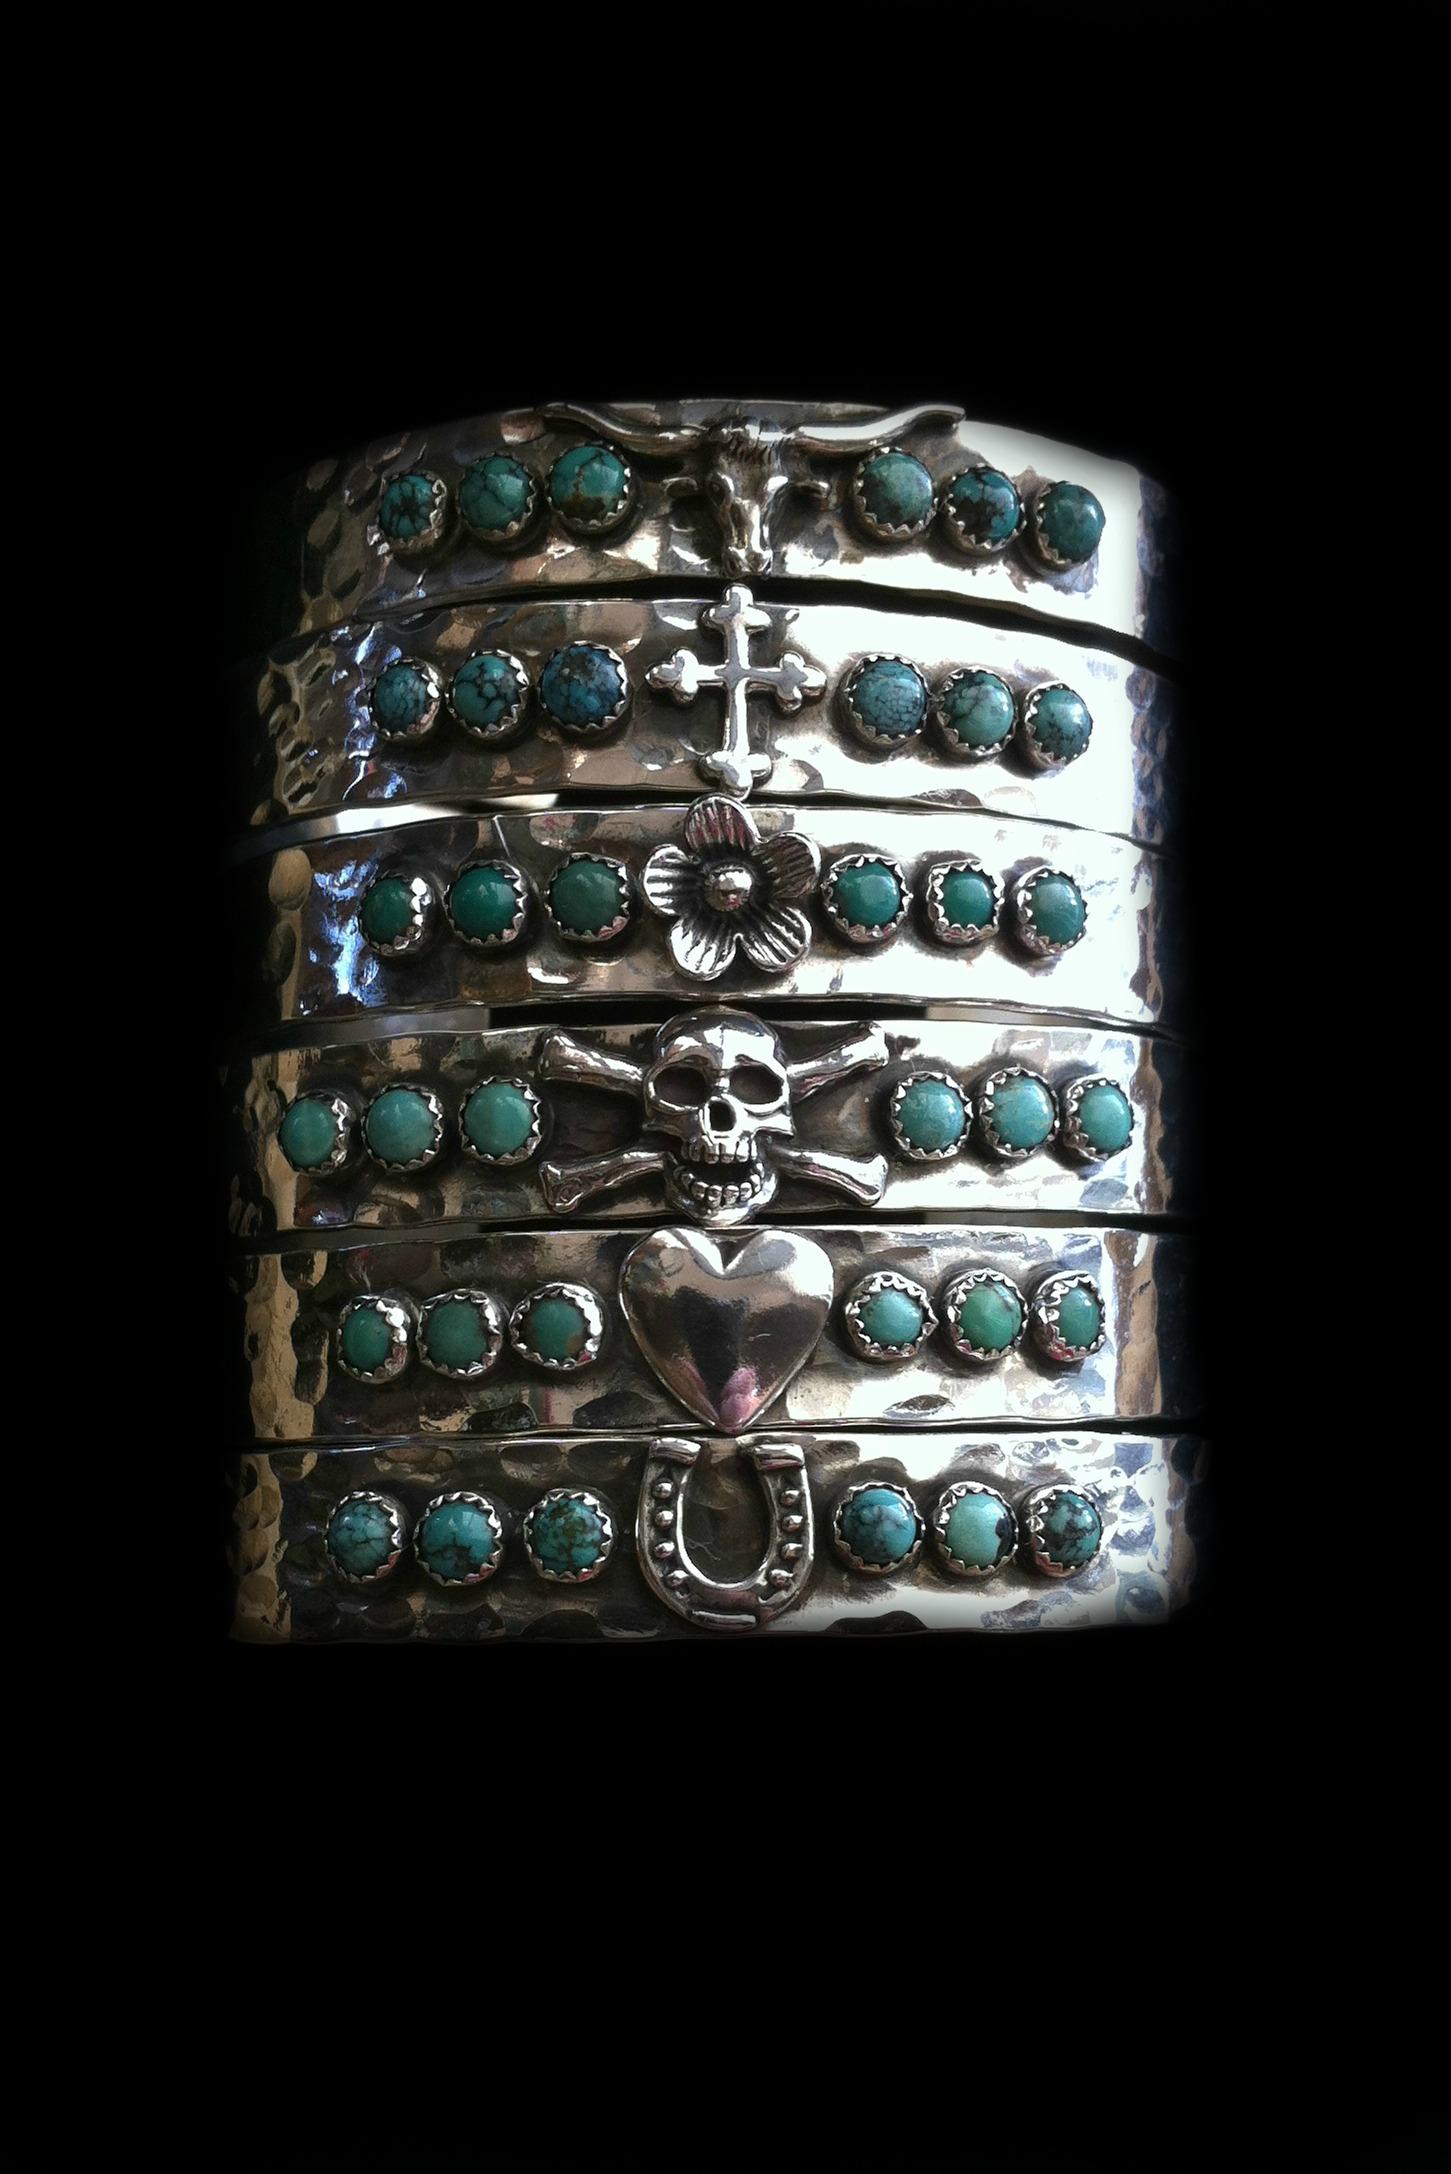 6 Stone Stack Cuffs